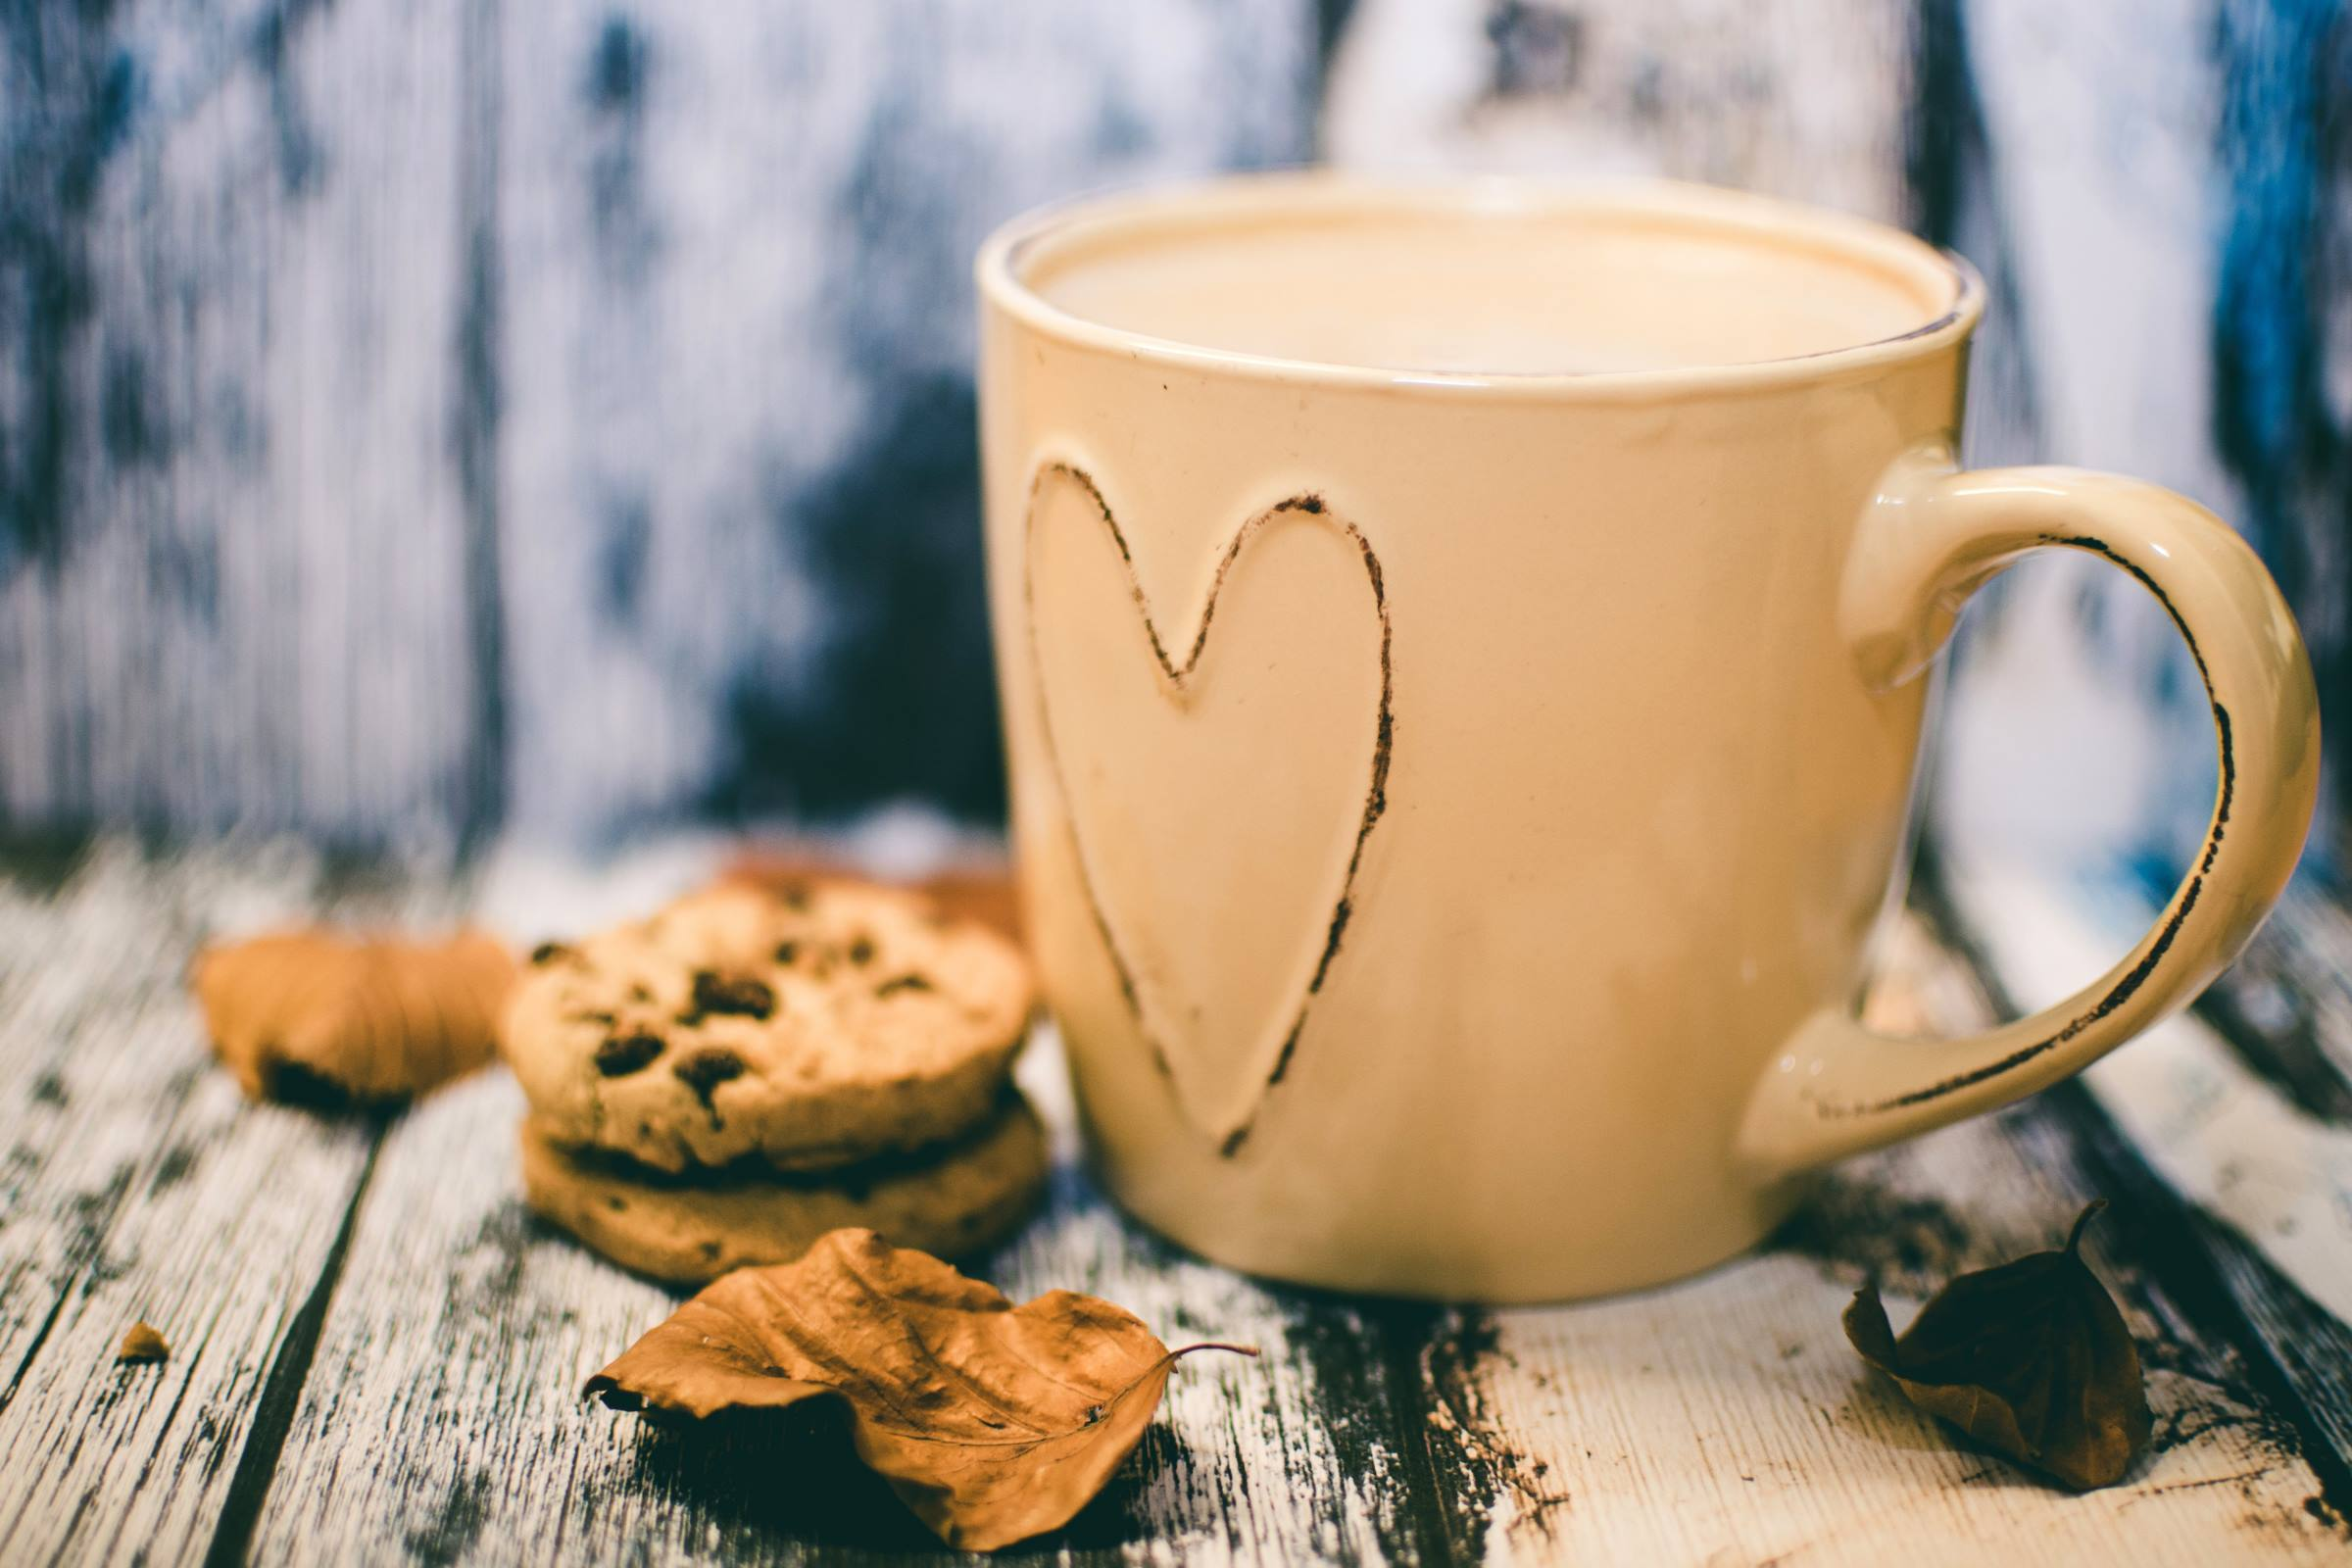 Coffee mug and cookies